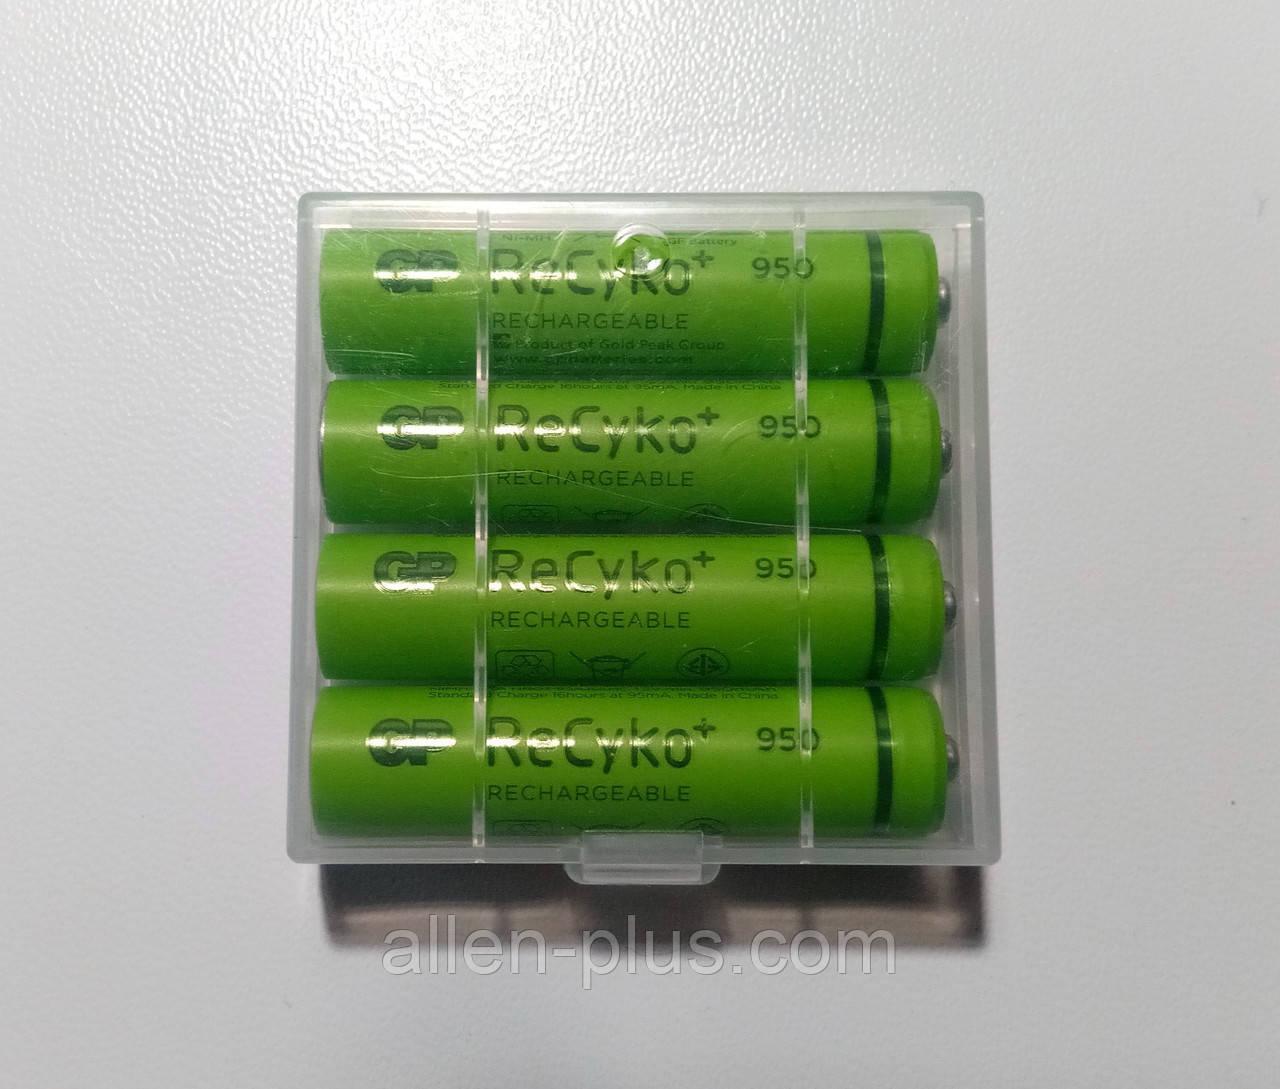 Комплект аккумуляторов (4 шт) GP Green Generation ReCyko+ АAА 1.2V 950mAh Ni-MH